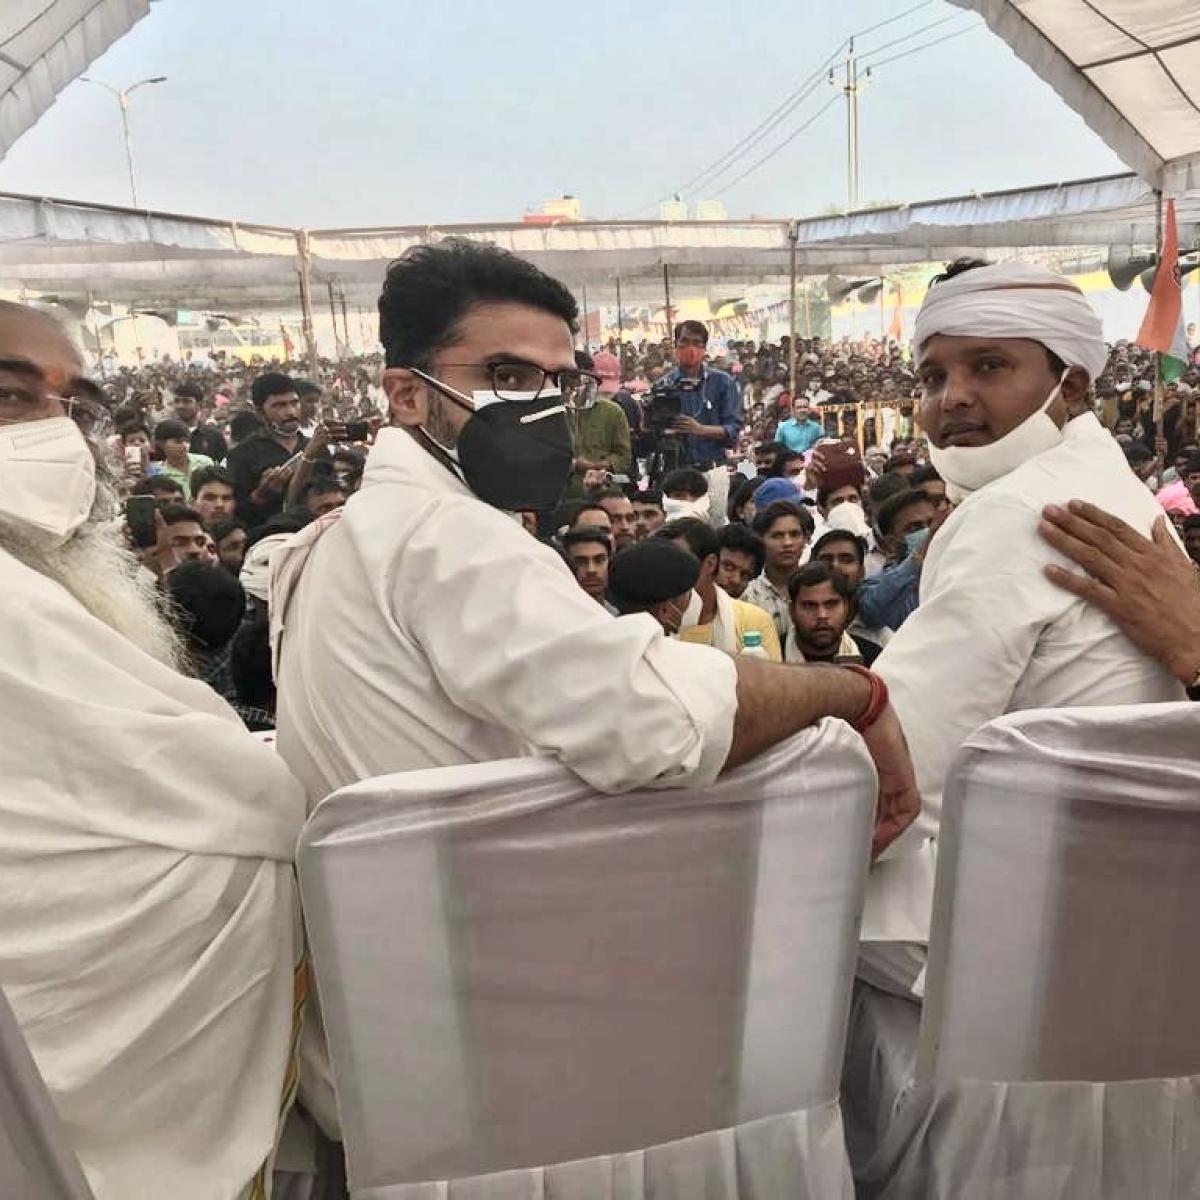 MP Bypolls: Sachin Pilot attacks BJP without mentioning Jyotiraditya Scindia